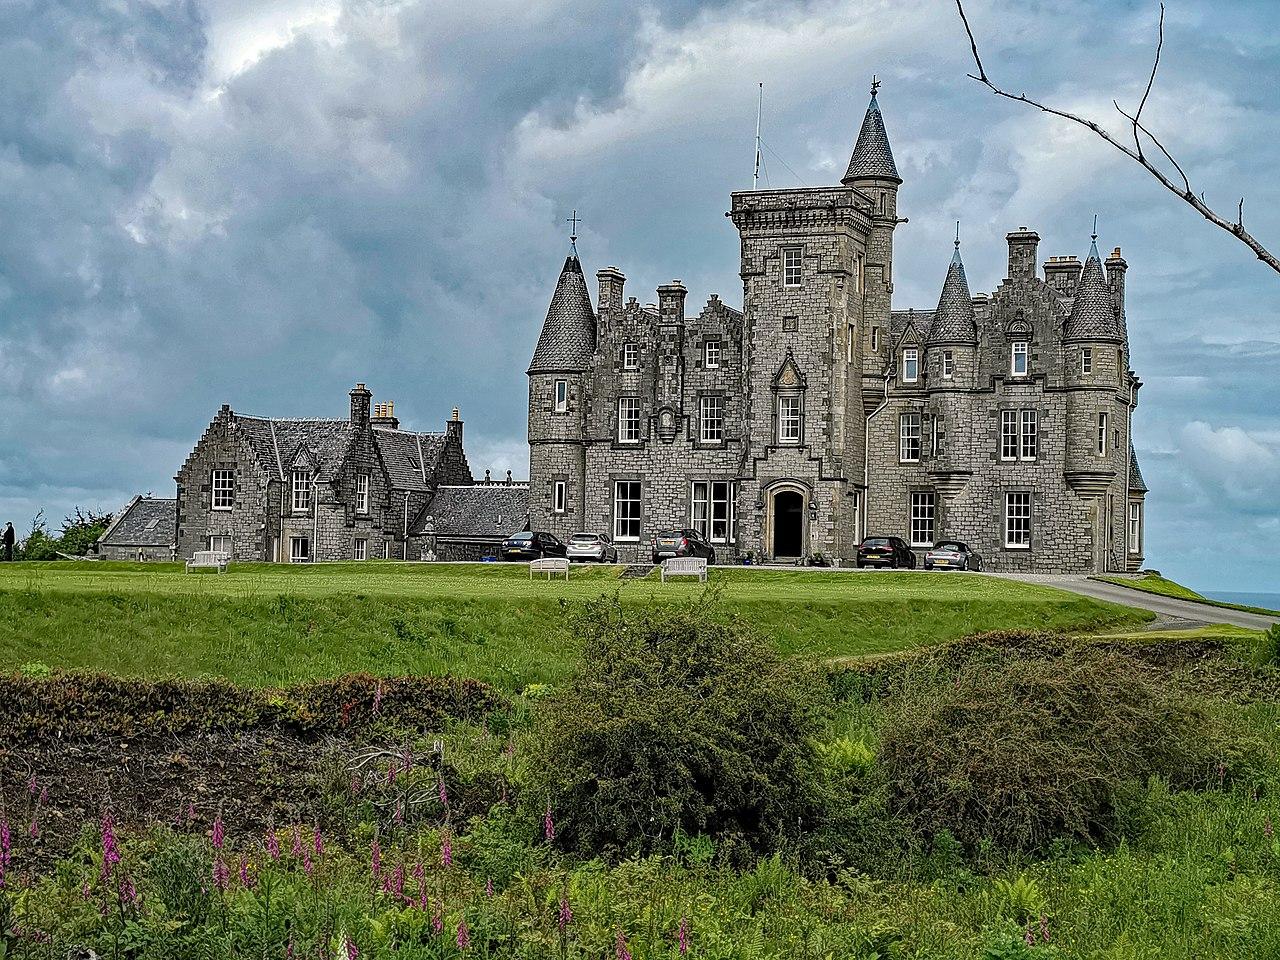 Still of Glengorm Castle